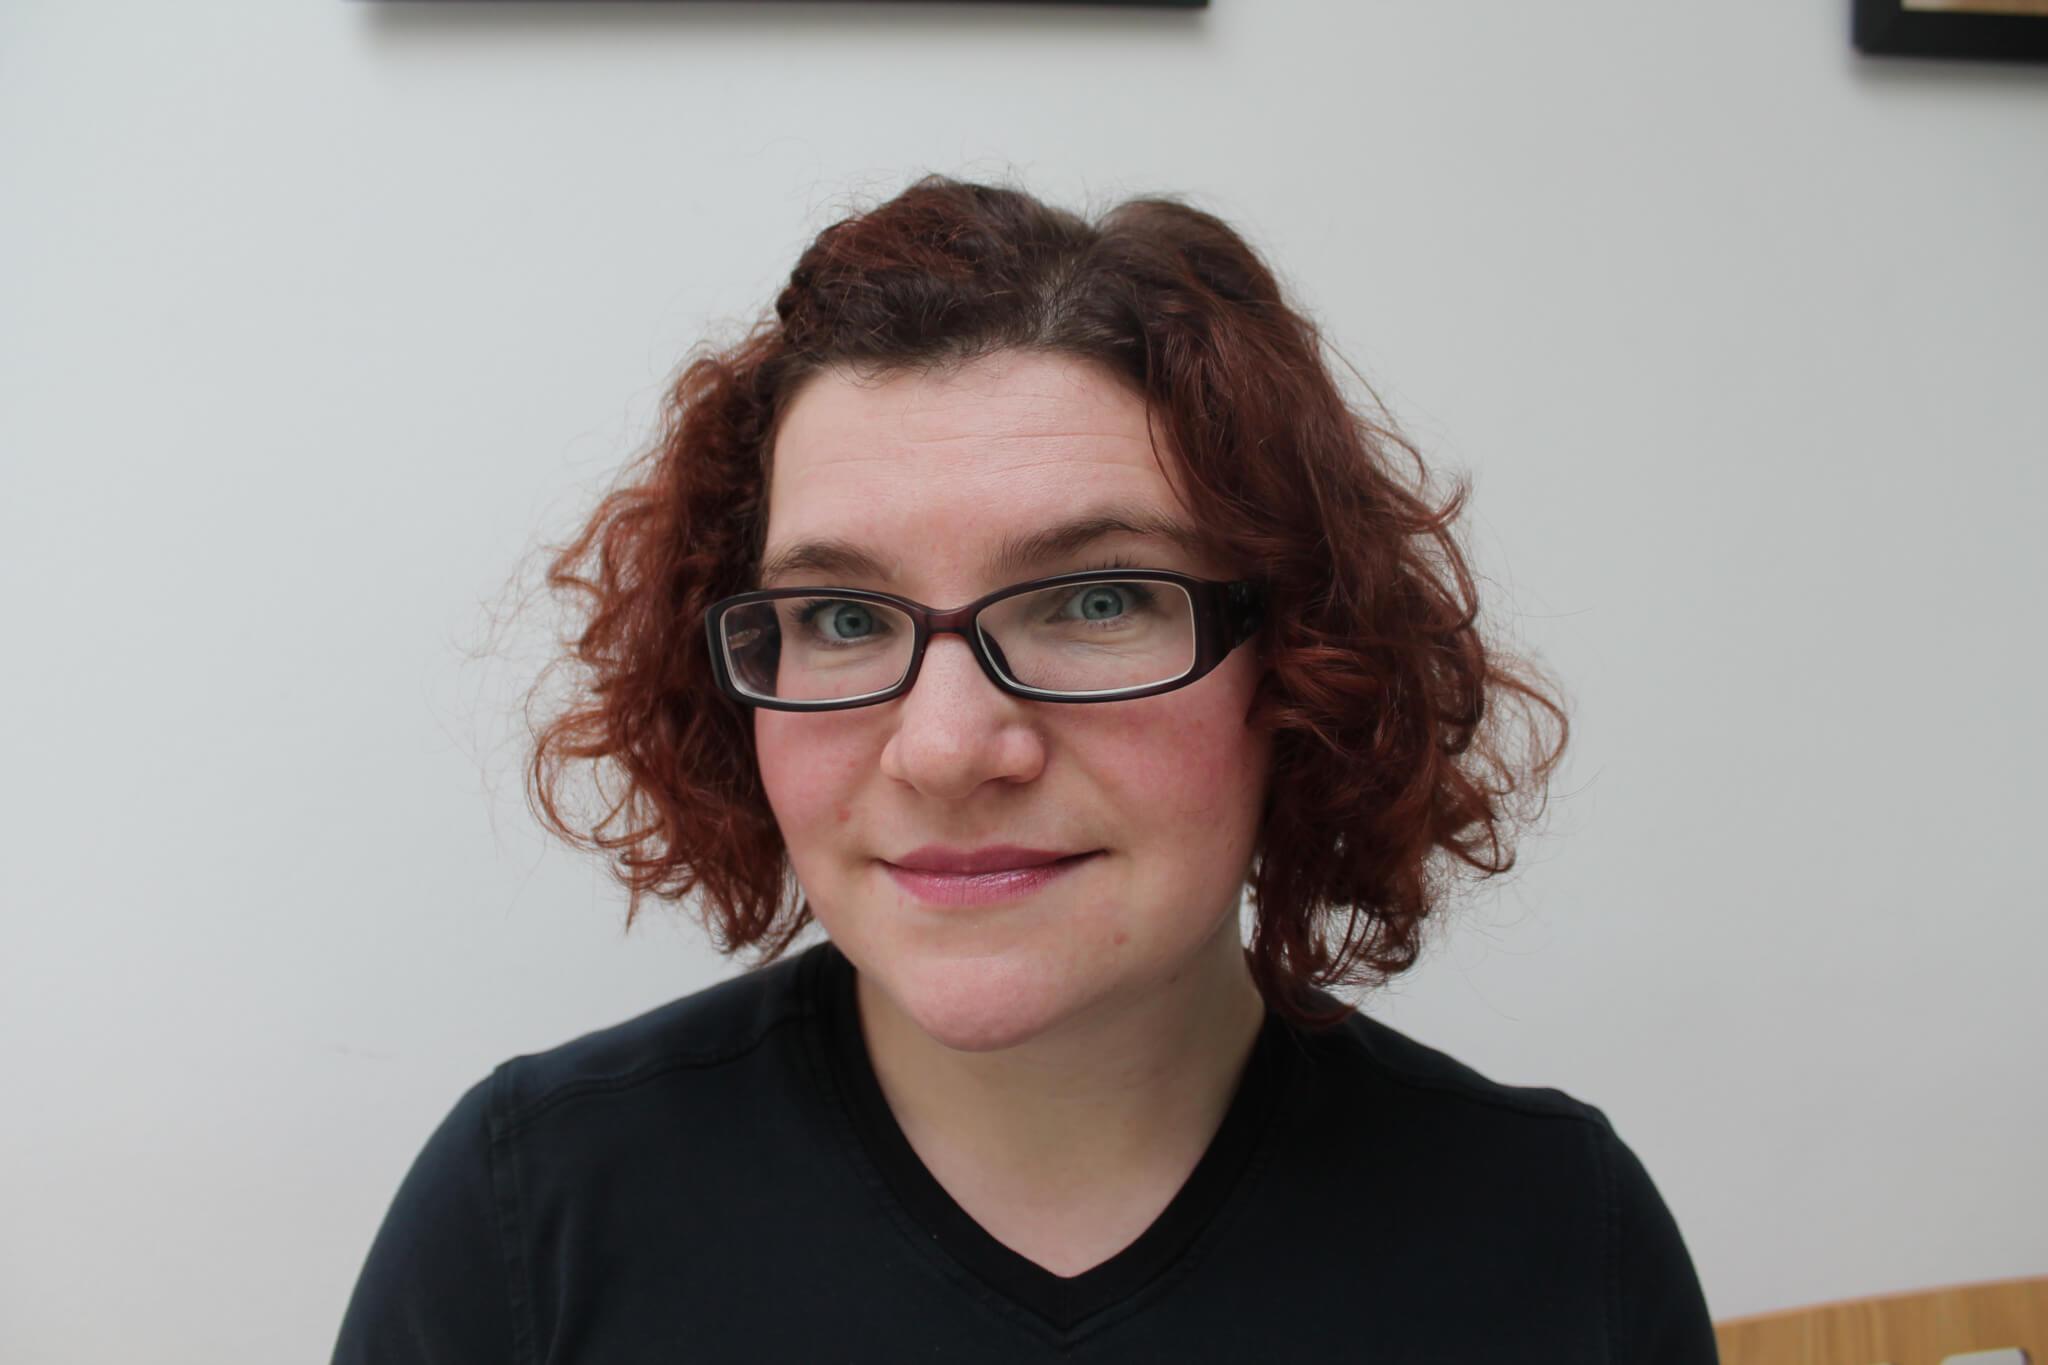 Martina Gavar